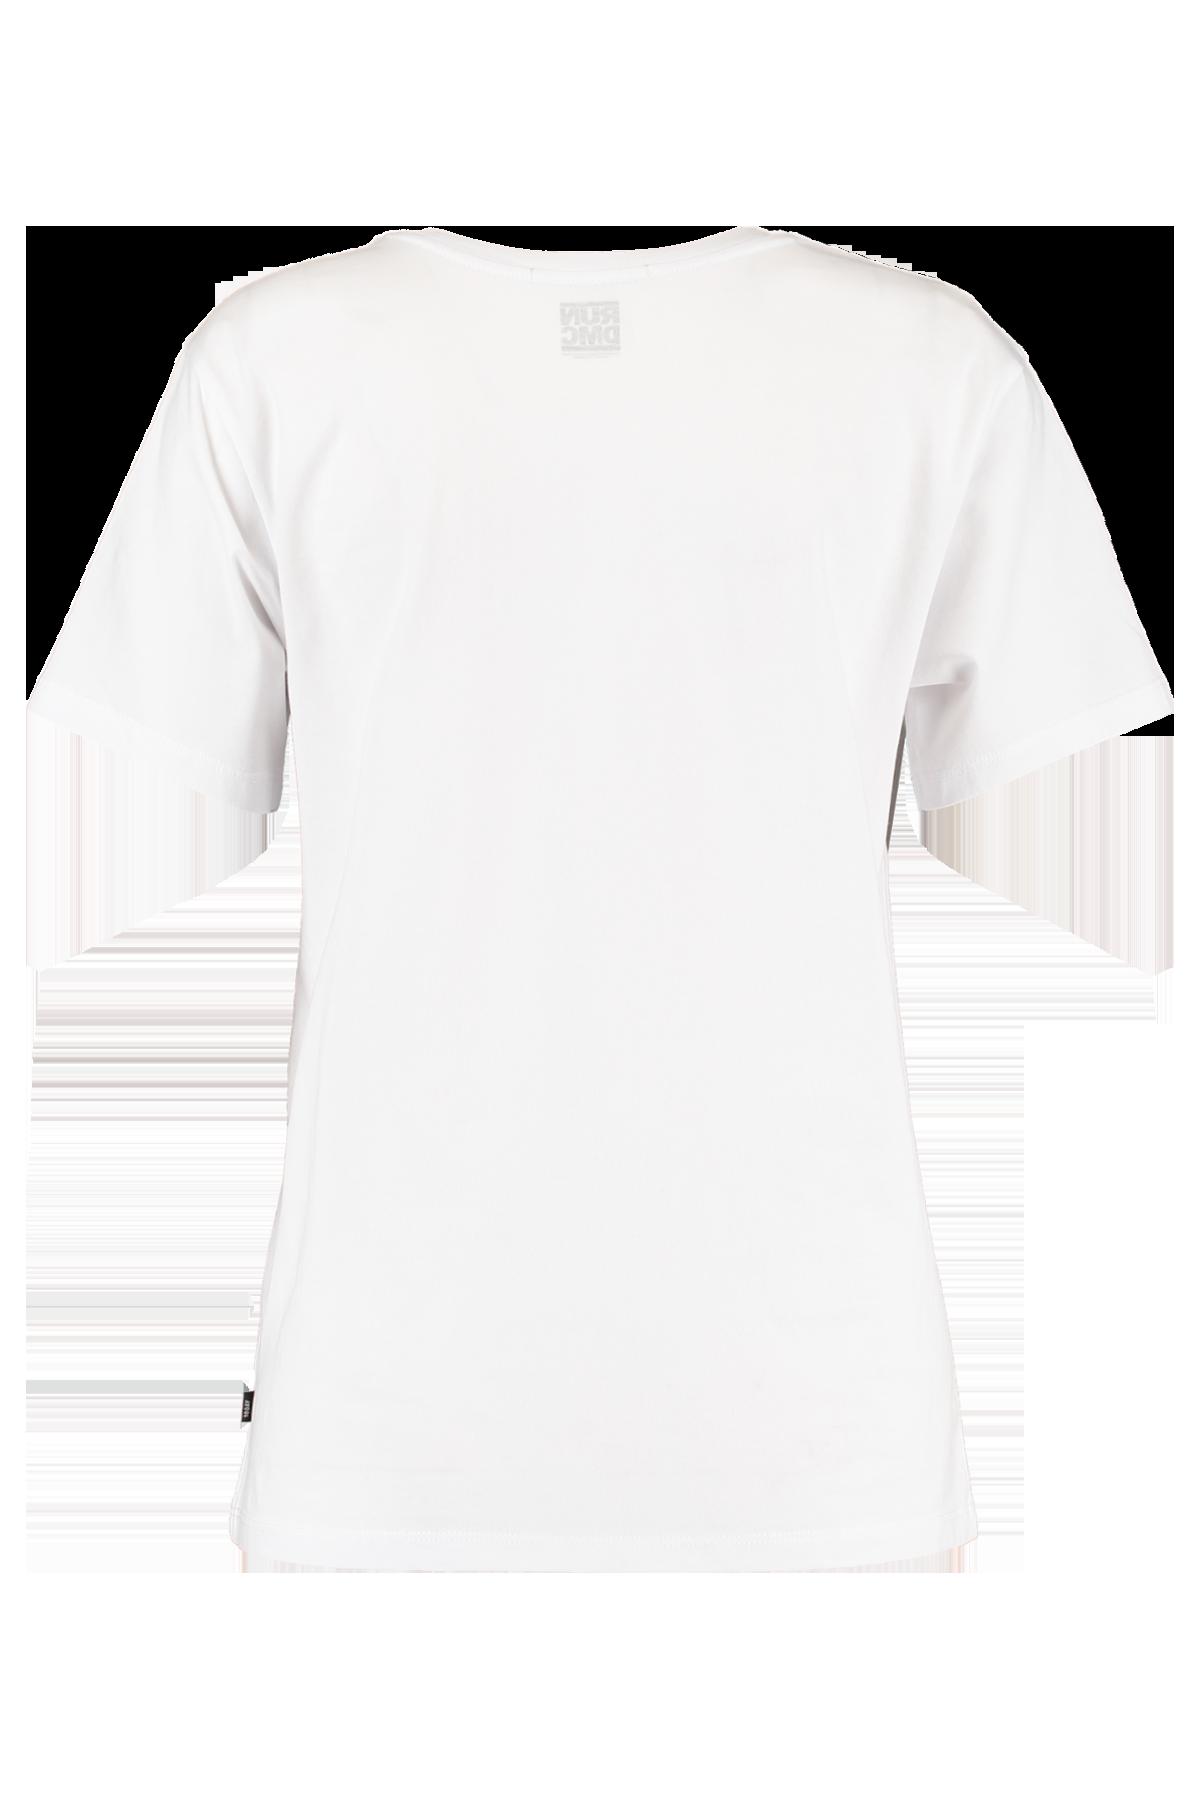 T-shirt Erica run DMC